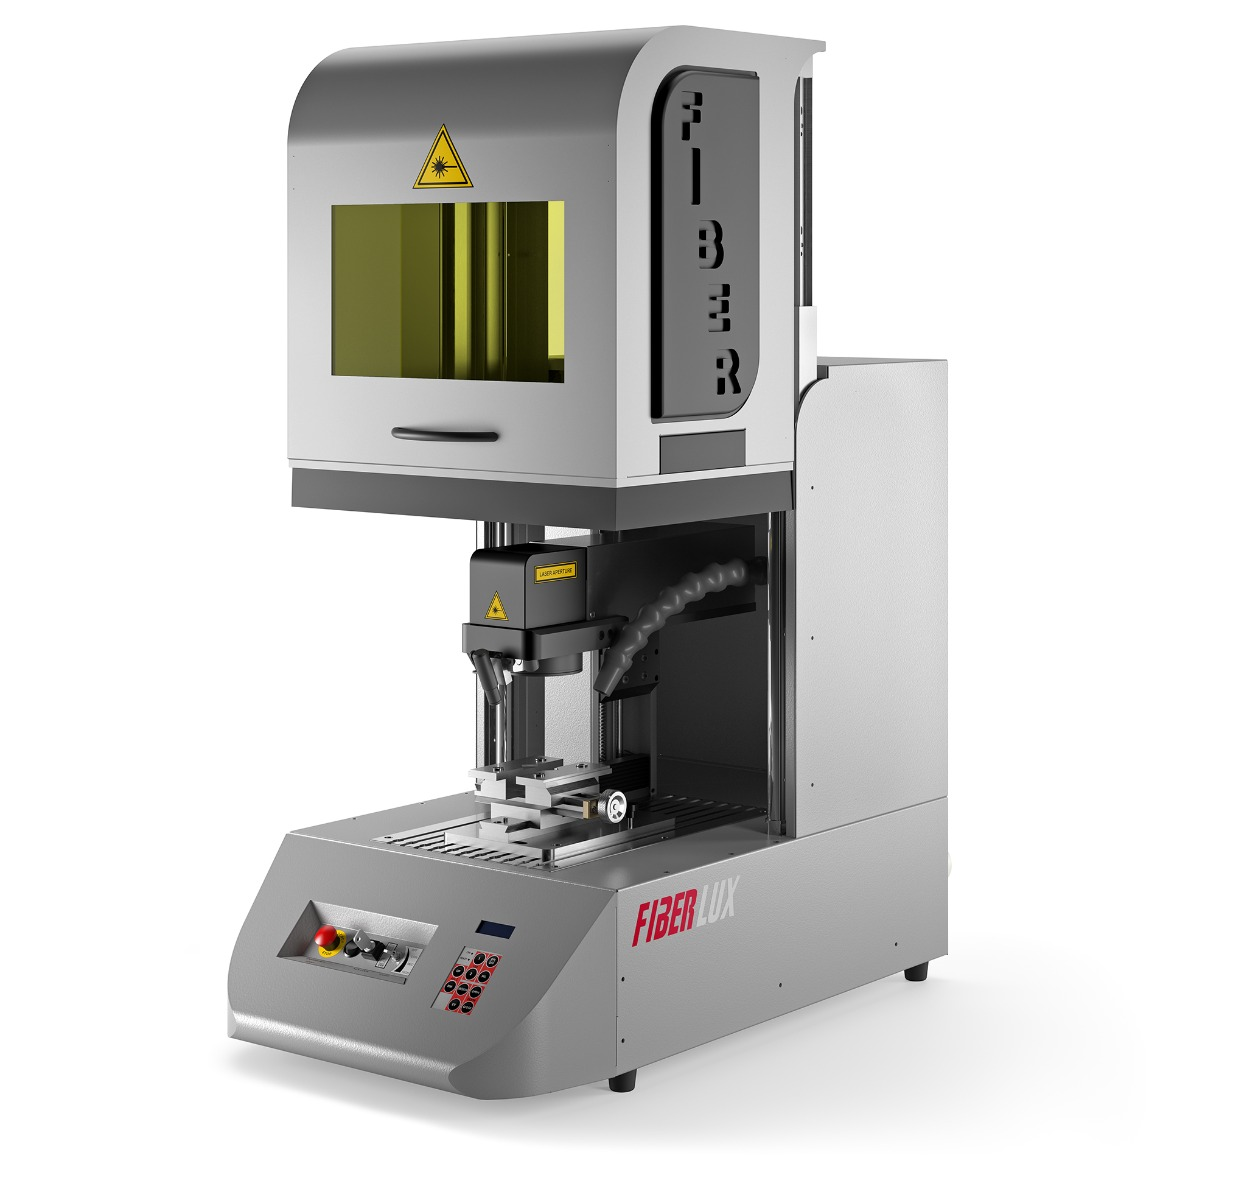 FiberLux EL Laser Engraver